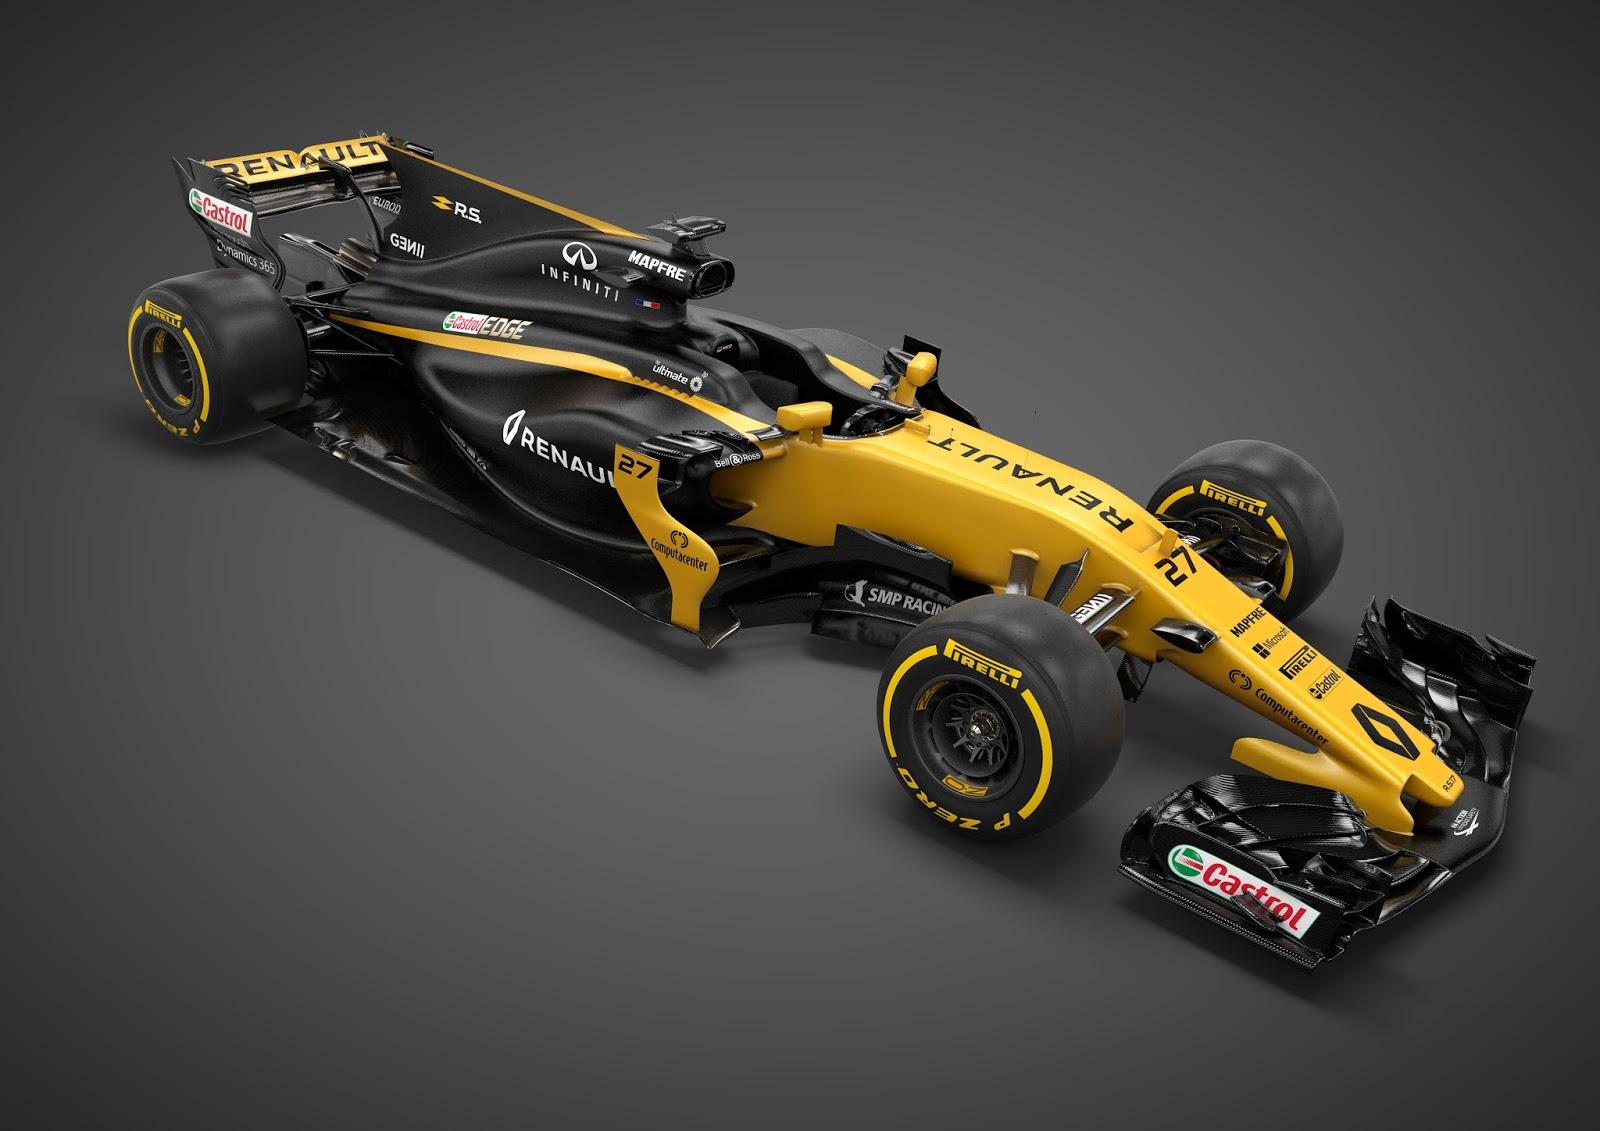 A3 RS17 3Q right dark studio 1 Η Renault Sport παρουσίασε το καινούργιο της μονοθέσιο, την R.S.17 F1, Formula 1, Renault, Renault Sport Formula 1 Team, videos